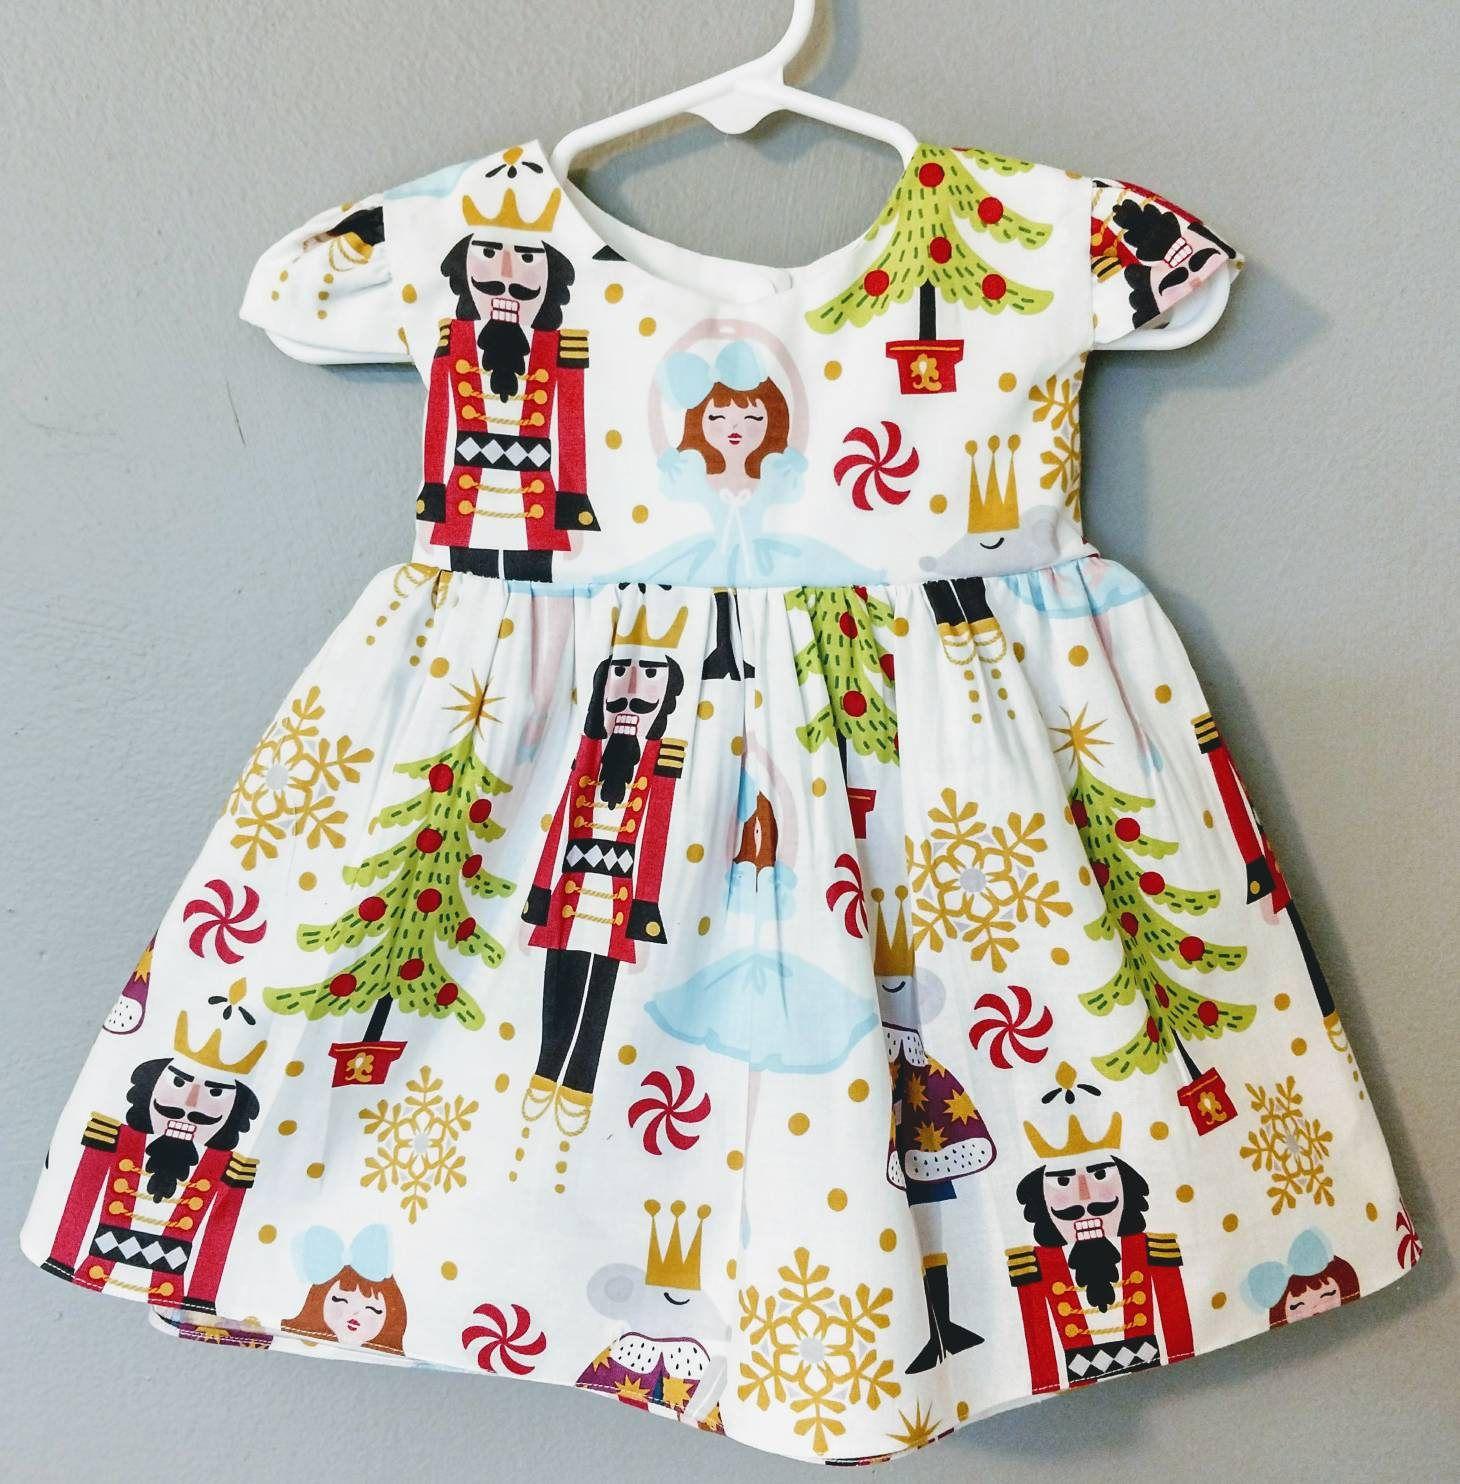 440a52e13 Nutcracker dress, Nutcracker toddler dress, girls Christmas dress, baby  Christmas dress, 1st Christmas dress, Christmas dress for girls, ...